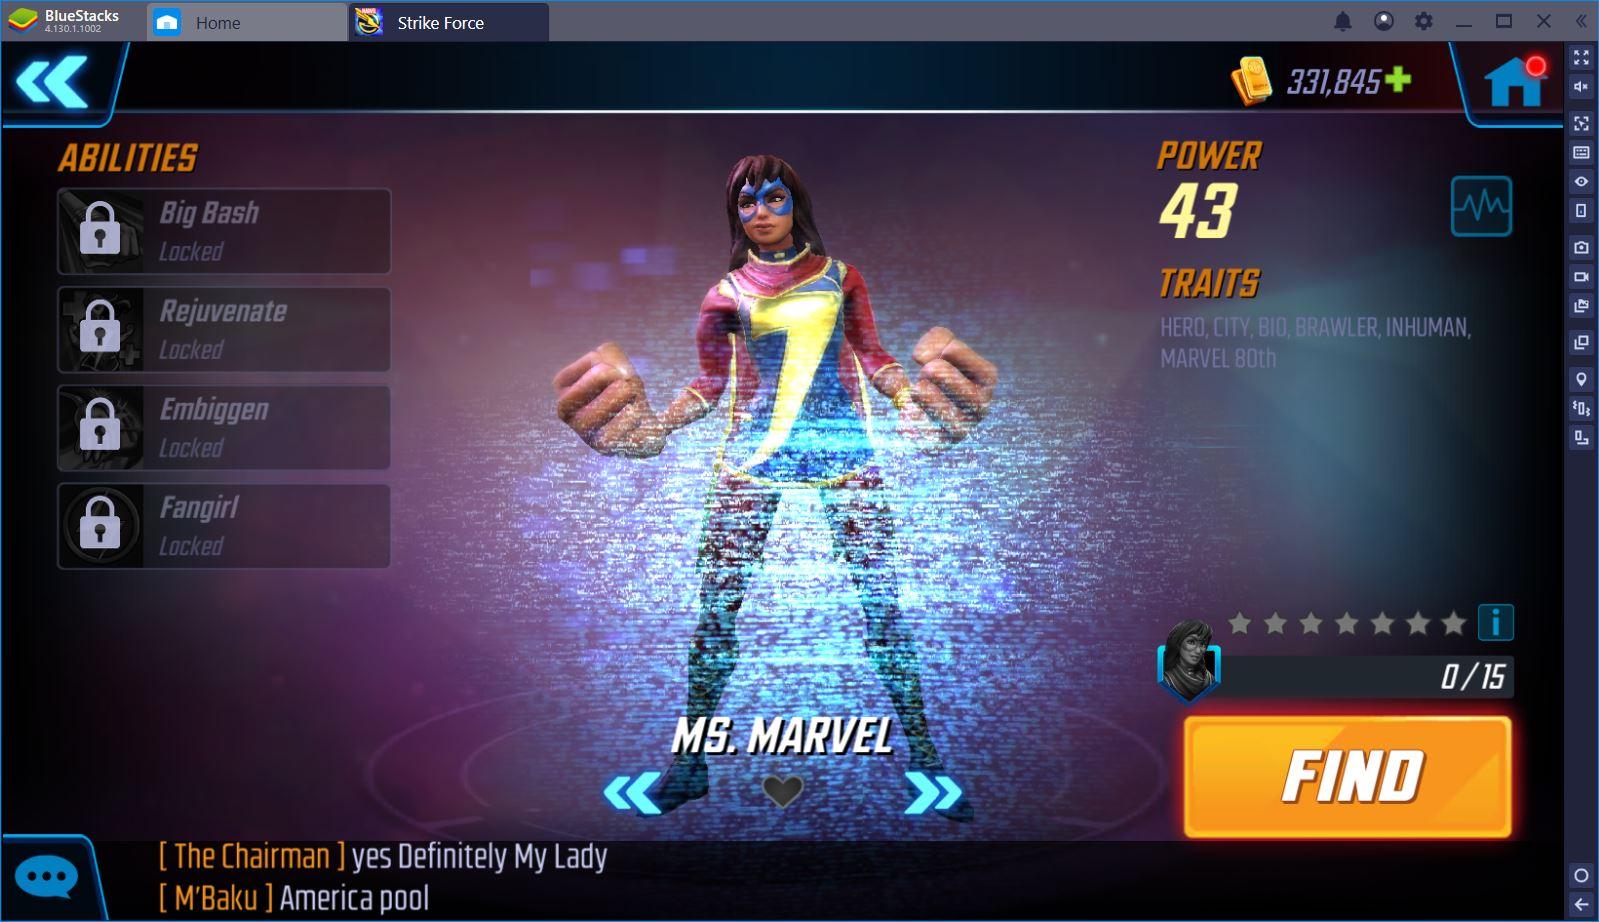 MARVEL Strike Force على الكمبيوتر: أفضل الفرق لمحتوى لاعب ضد لاعب